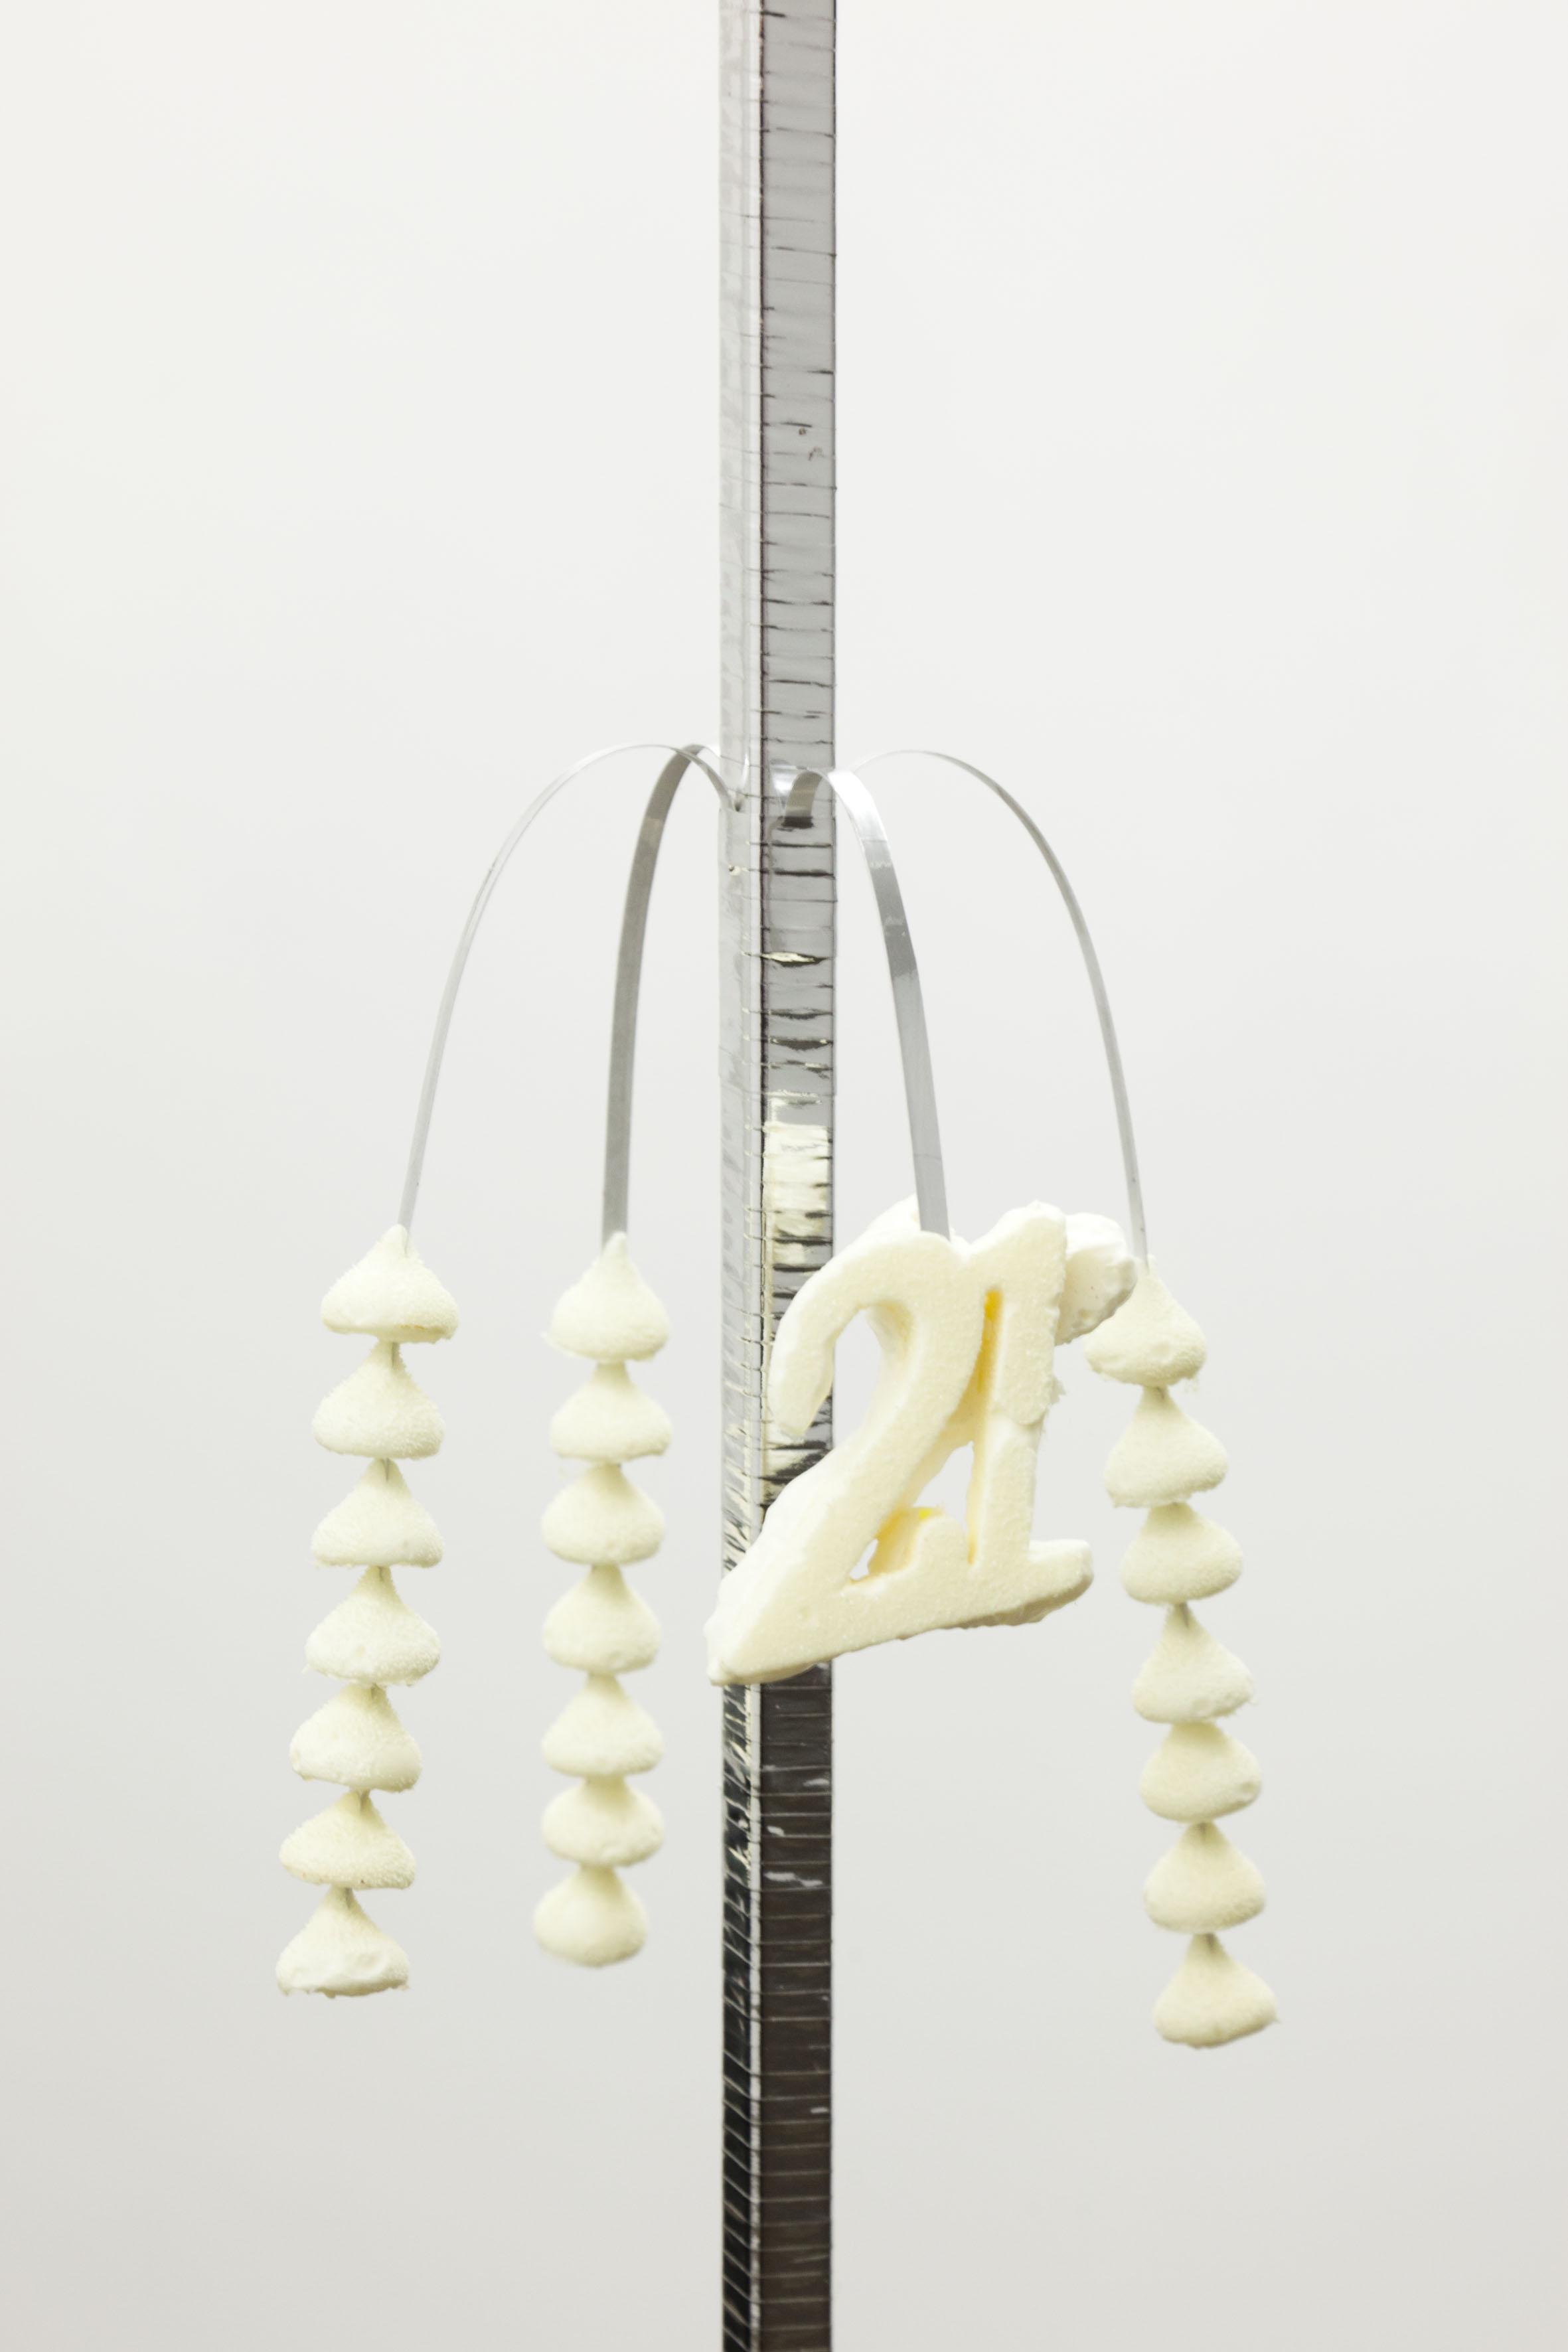 Forever 21 , 2012, polyurethane expanding foam, automatic fragrance dispenser, ribbon, Alternate Universal Studios , Firstdraft, Sydney. Photography: Silversalt Photography. Copyright JD Reforma